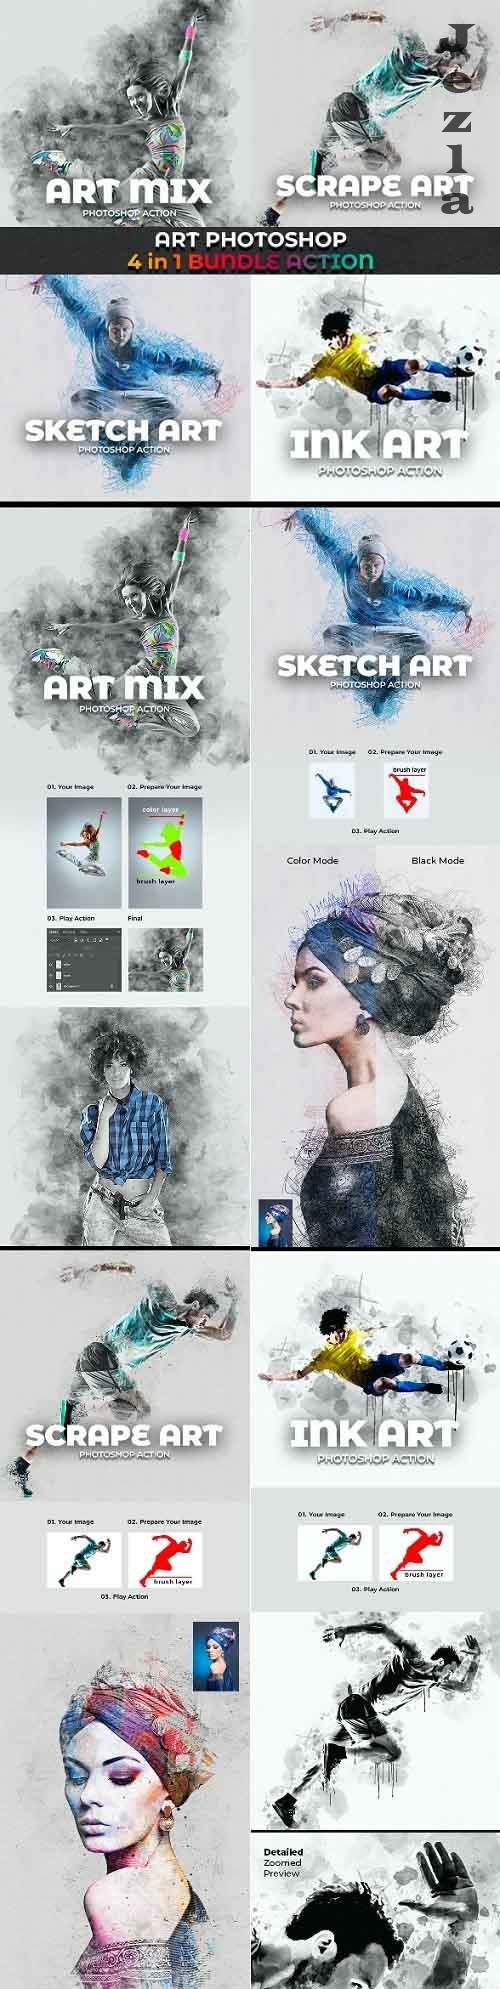 GraphicRiver - Art Photoshop Action 4 in 1 Bundle 29133173